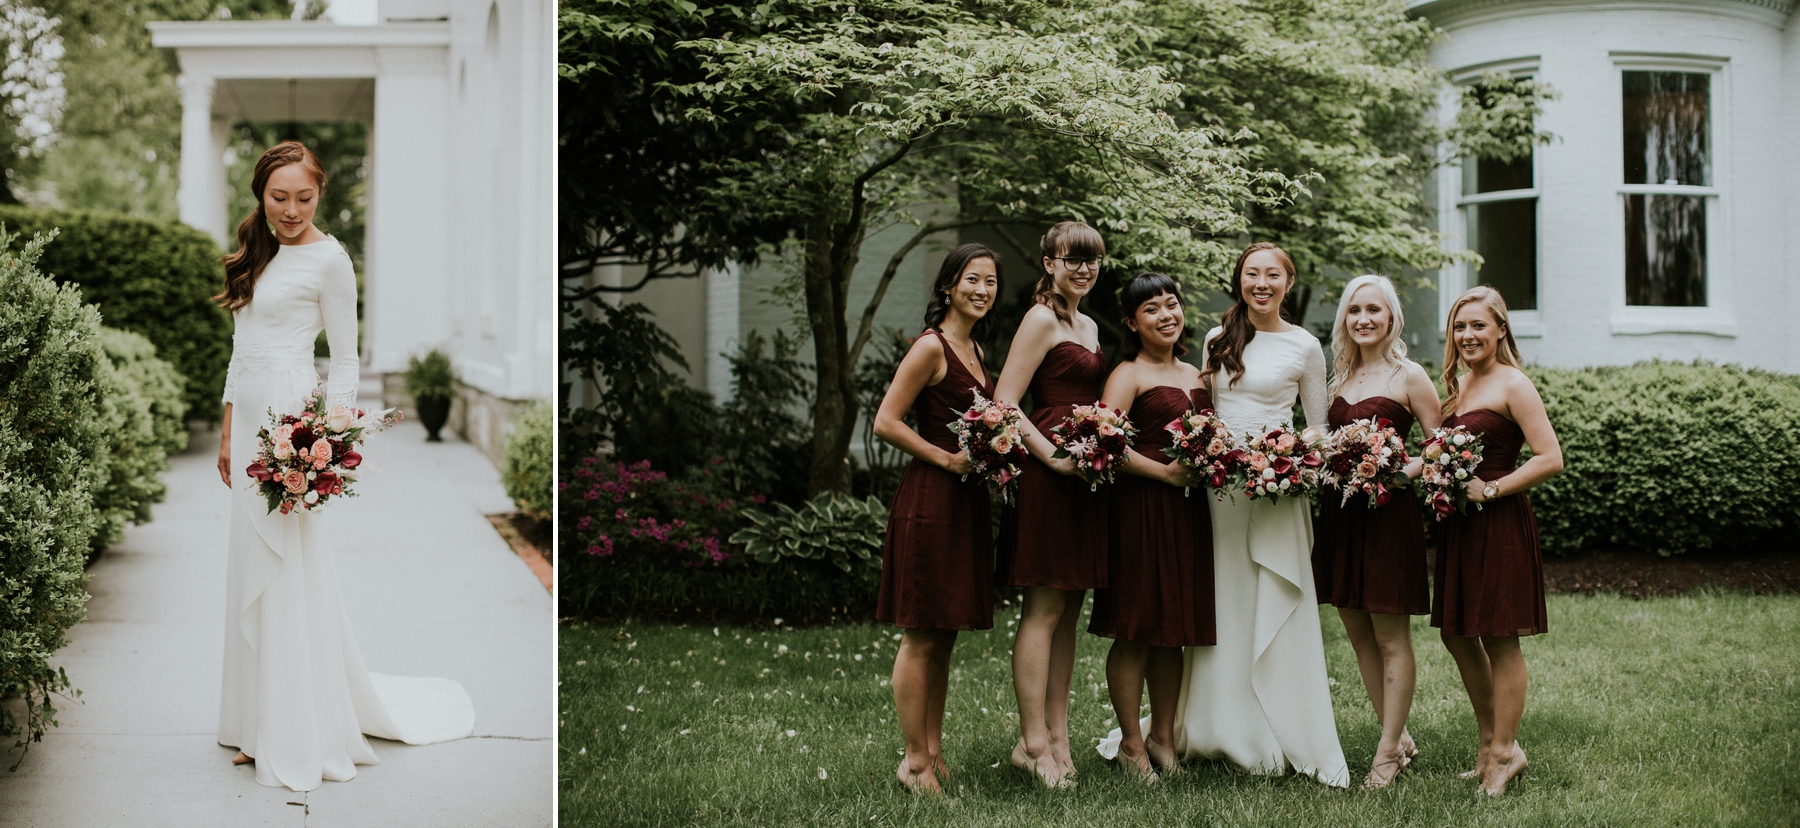 washington_dc_ceresville_mansion_wedding_photography 17.jpg